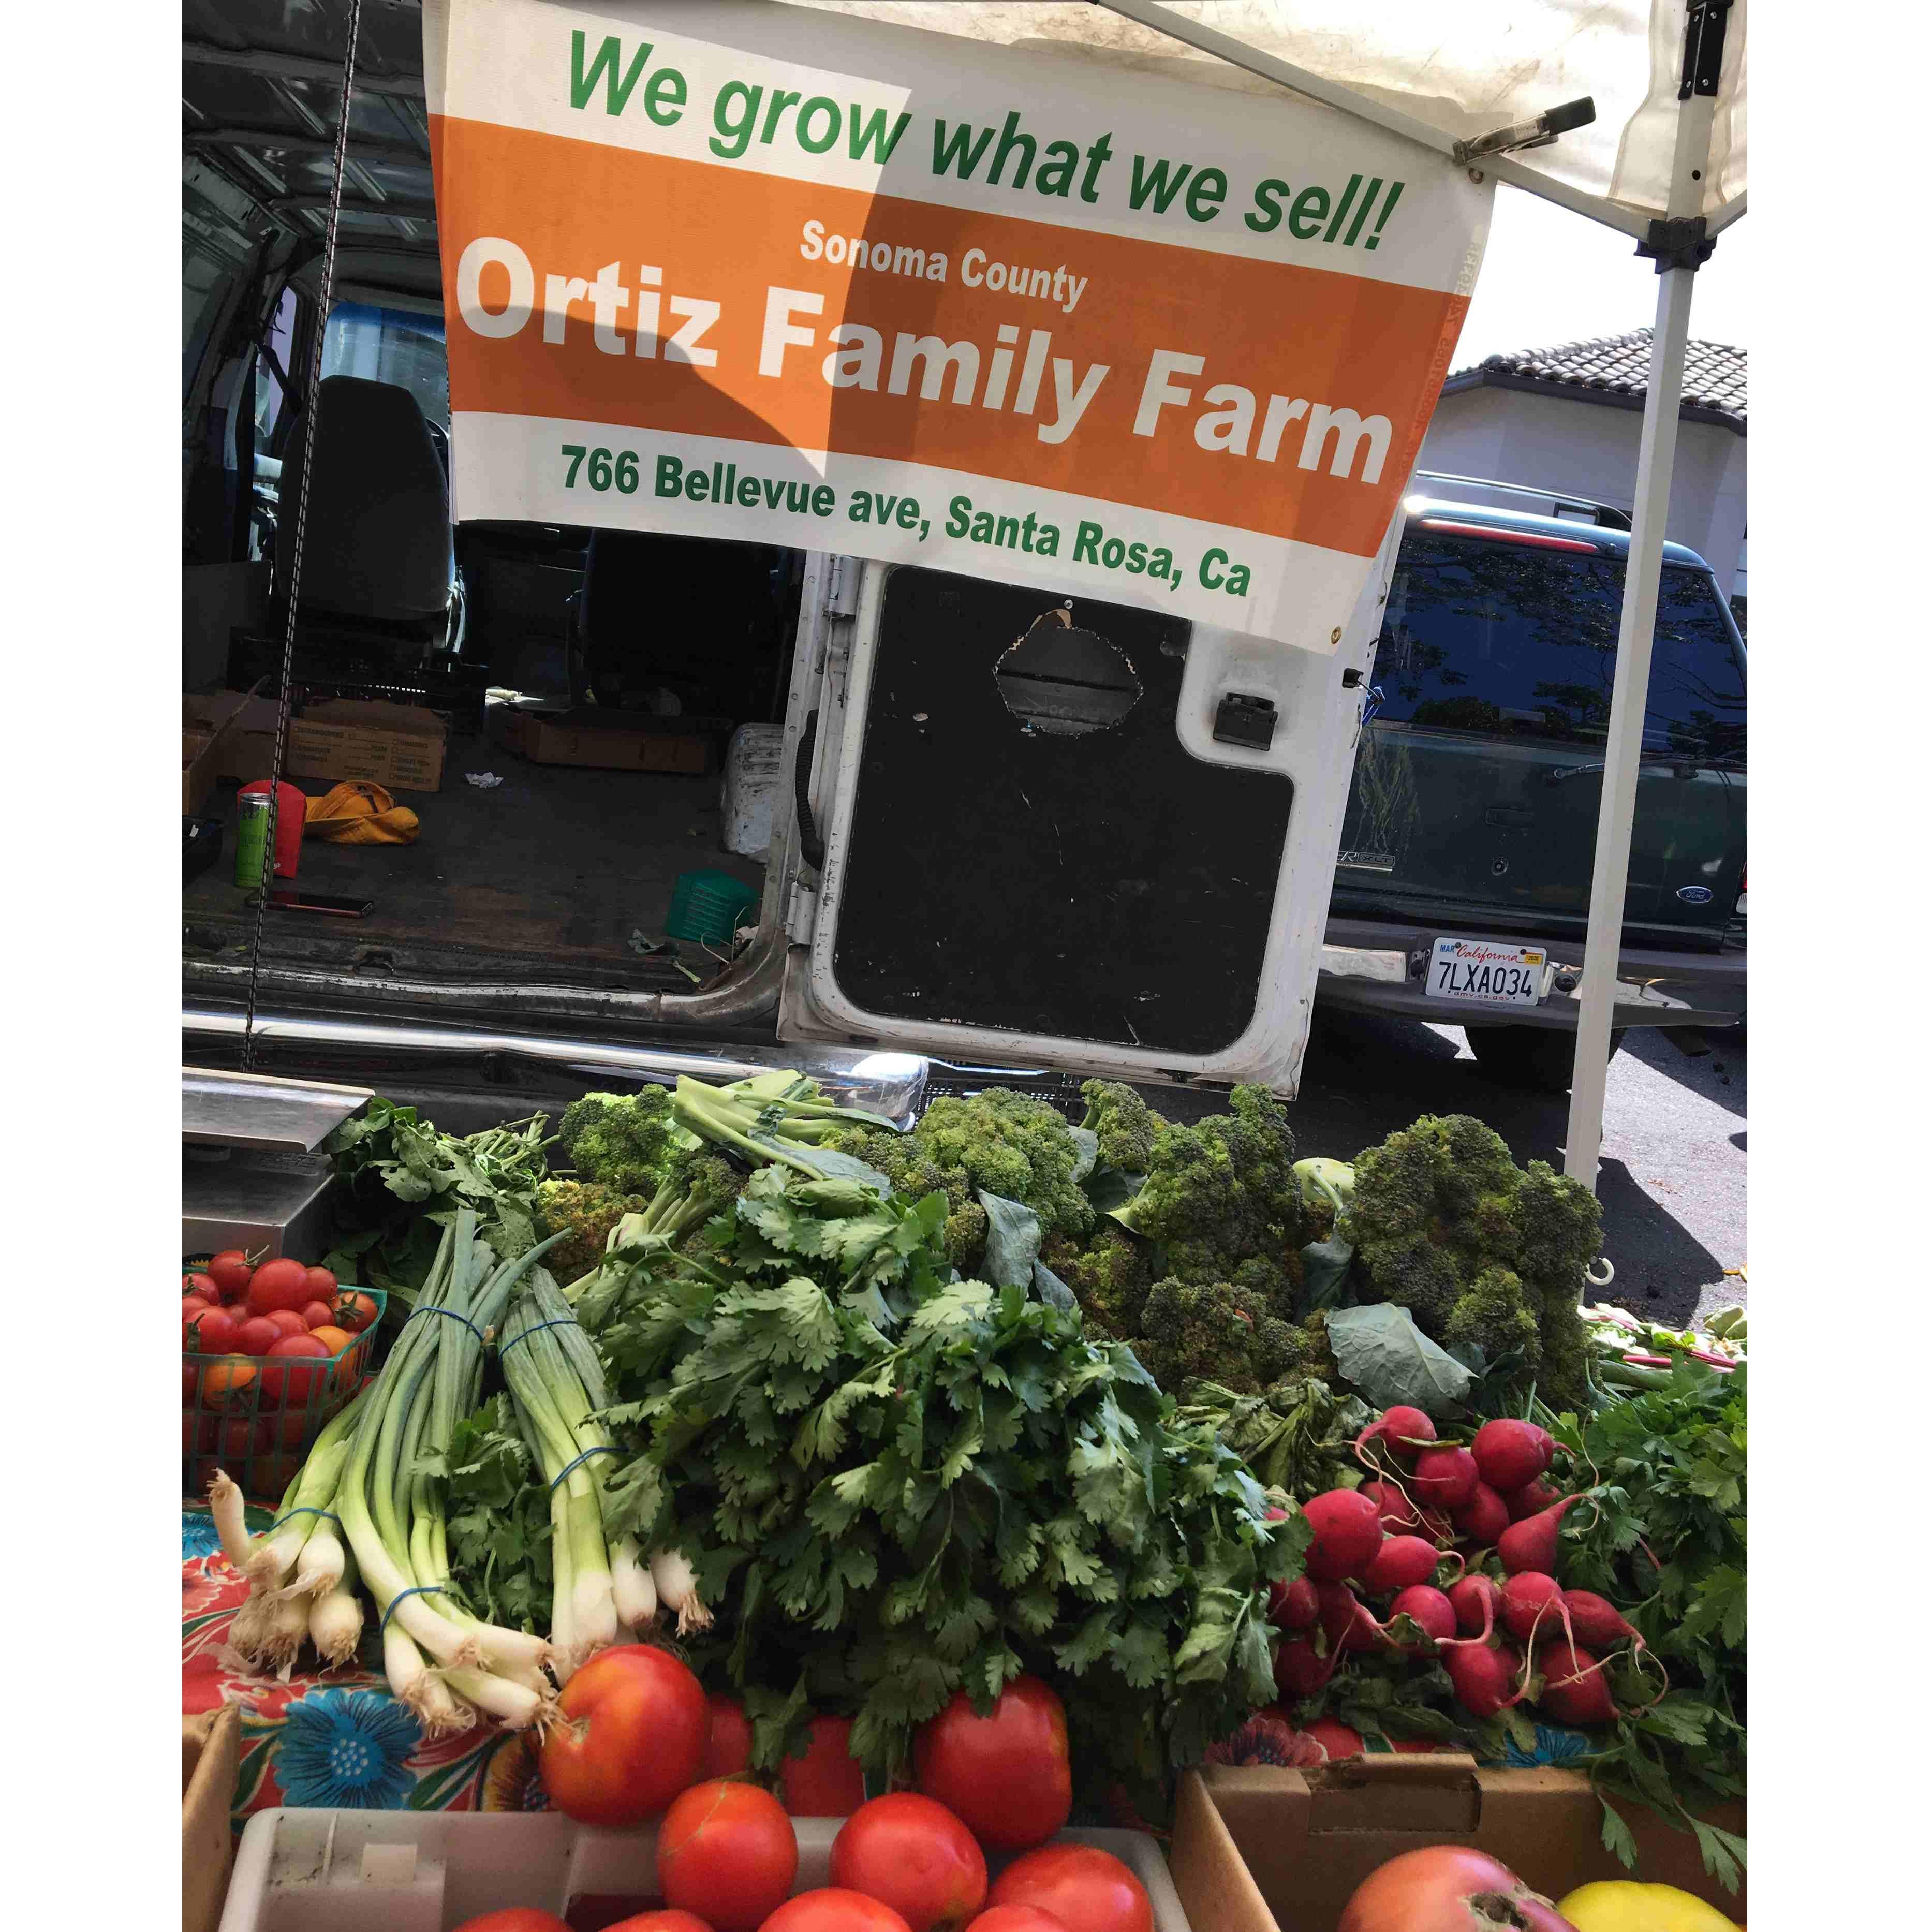 Ortiz Family Farm